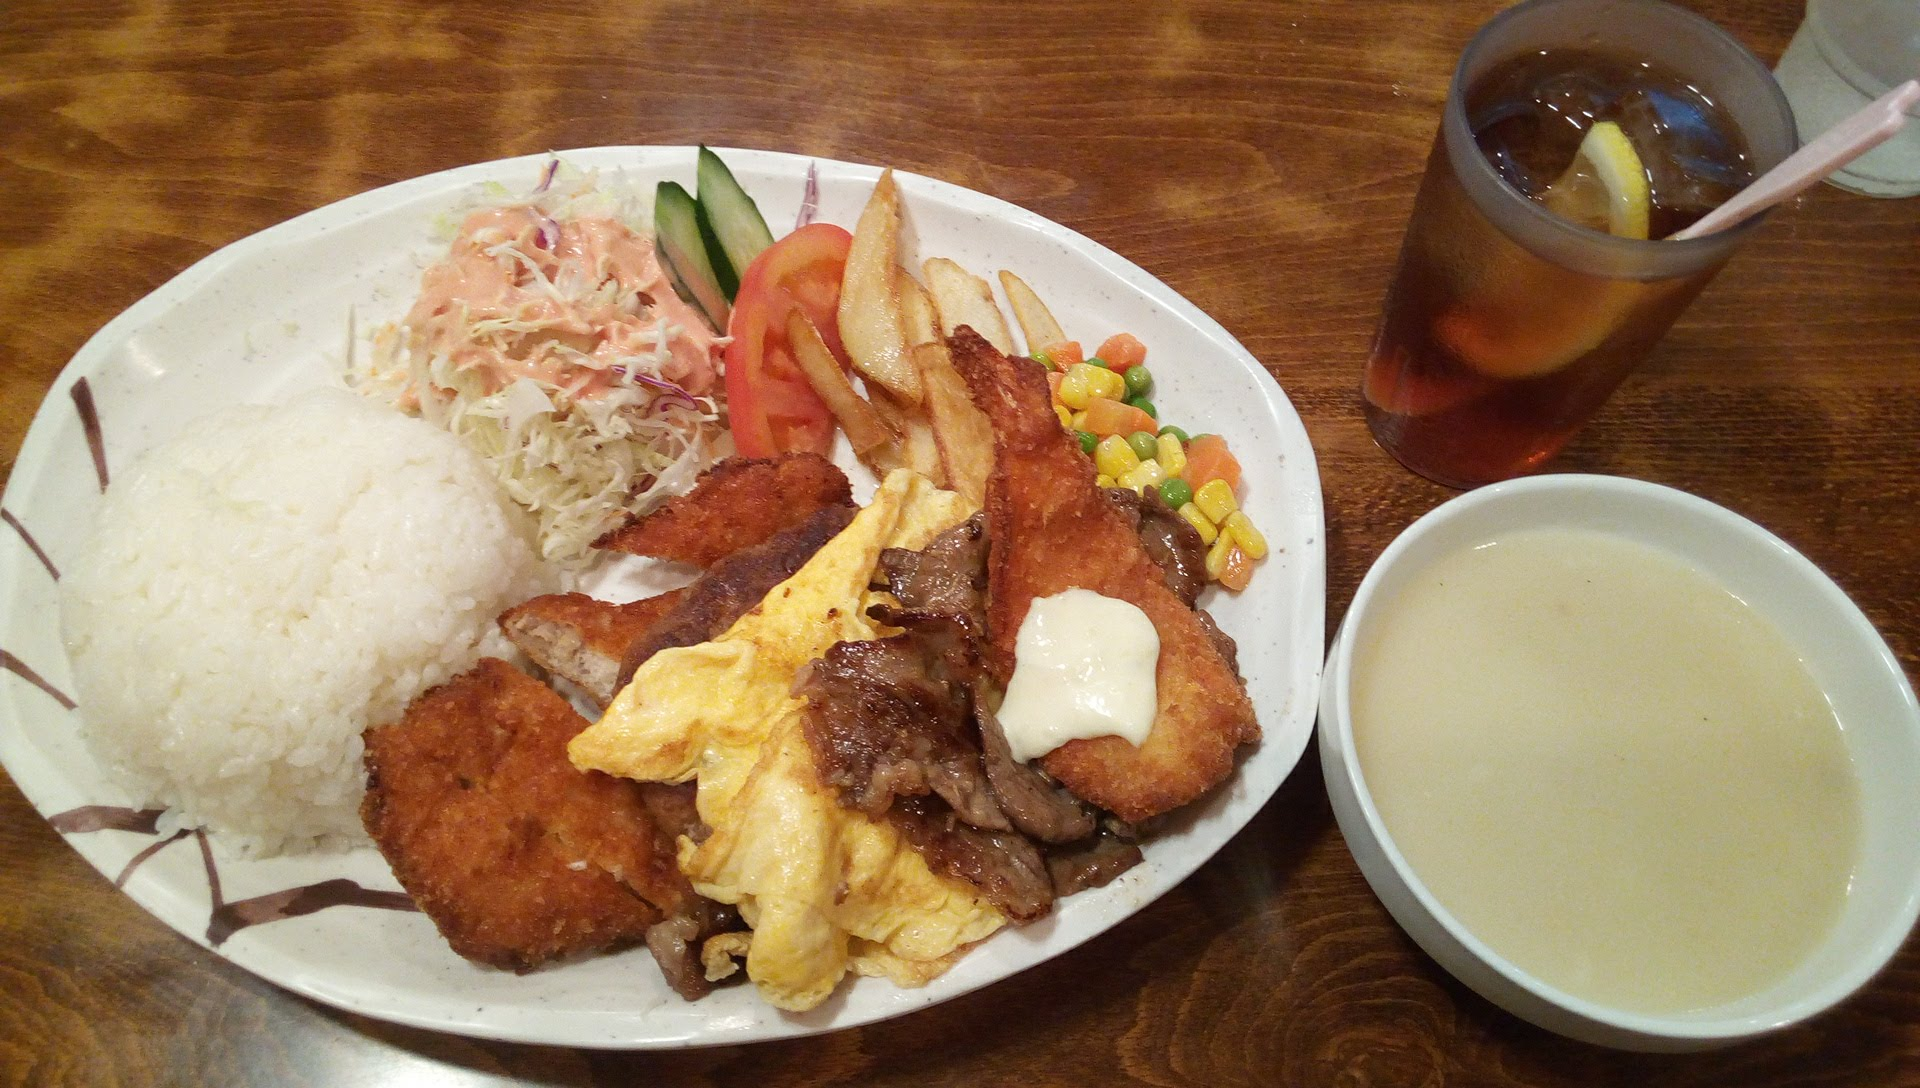 Kuni lunch